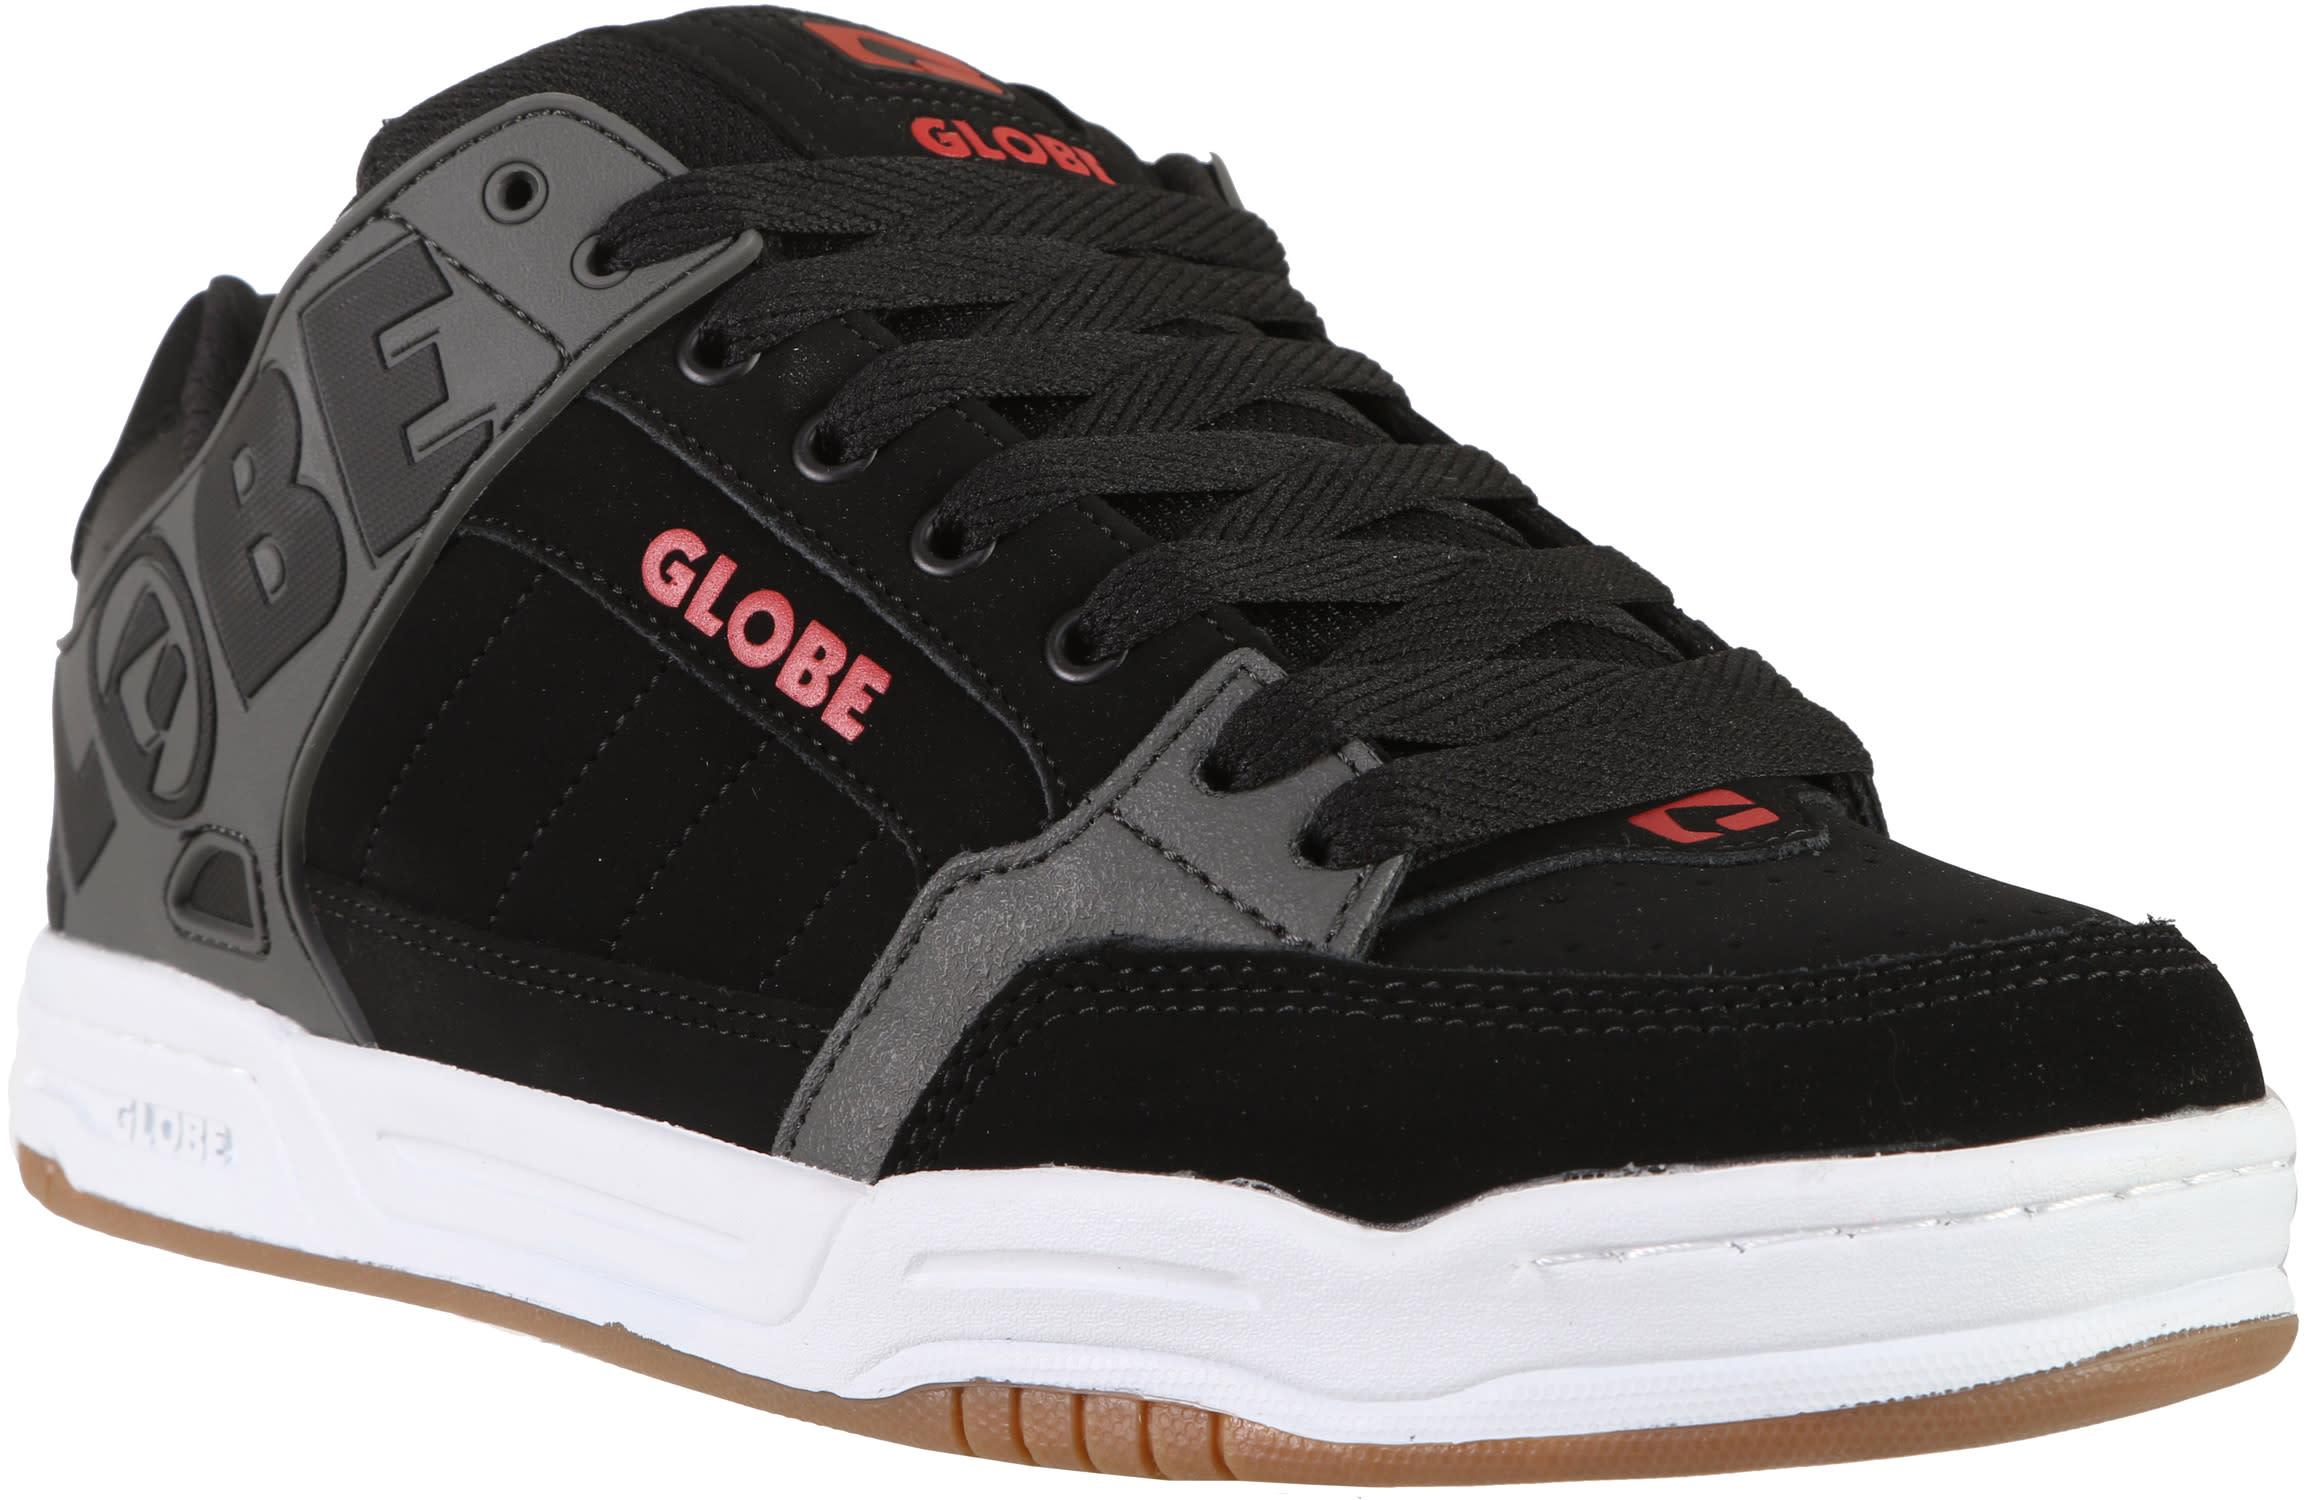 c18e9a150bb9 Globe Tilt Skate Shoes - thumbnail 2